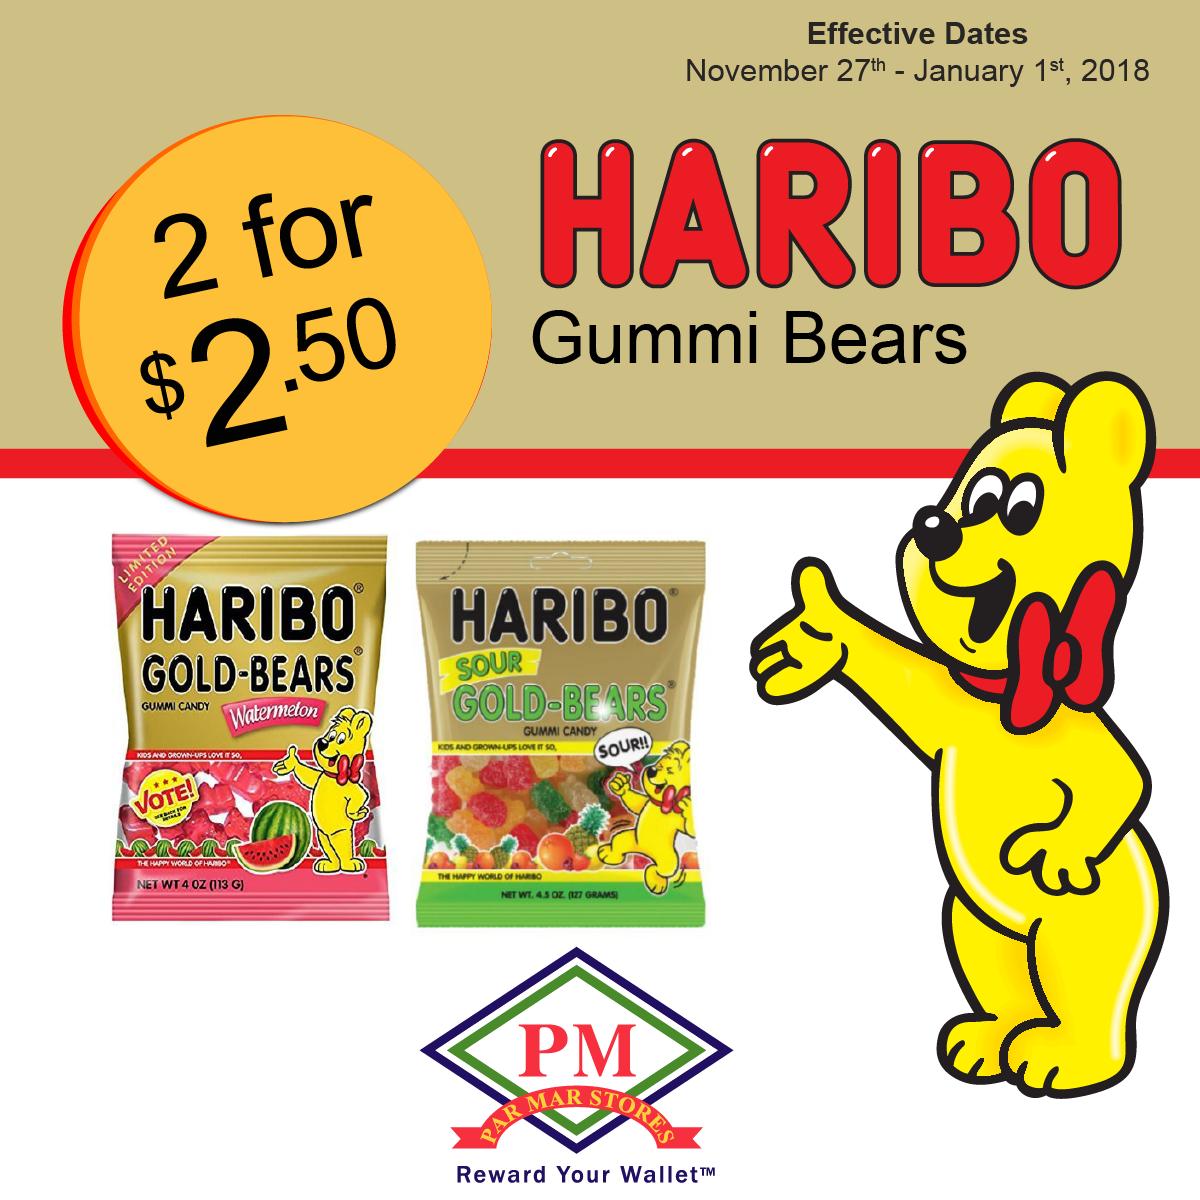 Haribo Gummi Bears